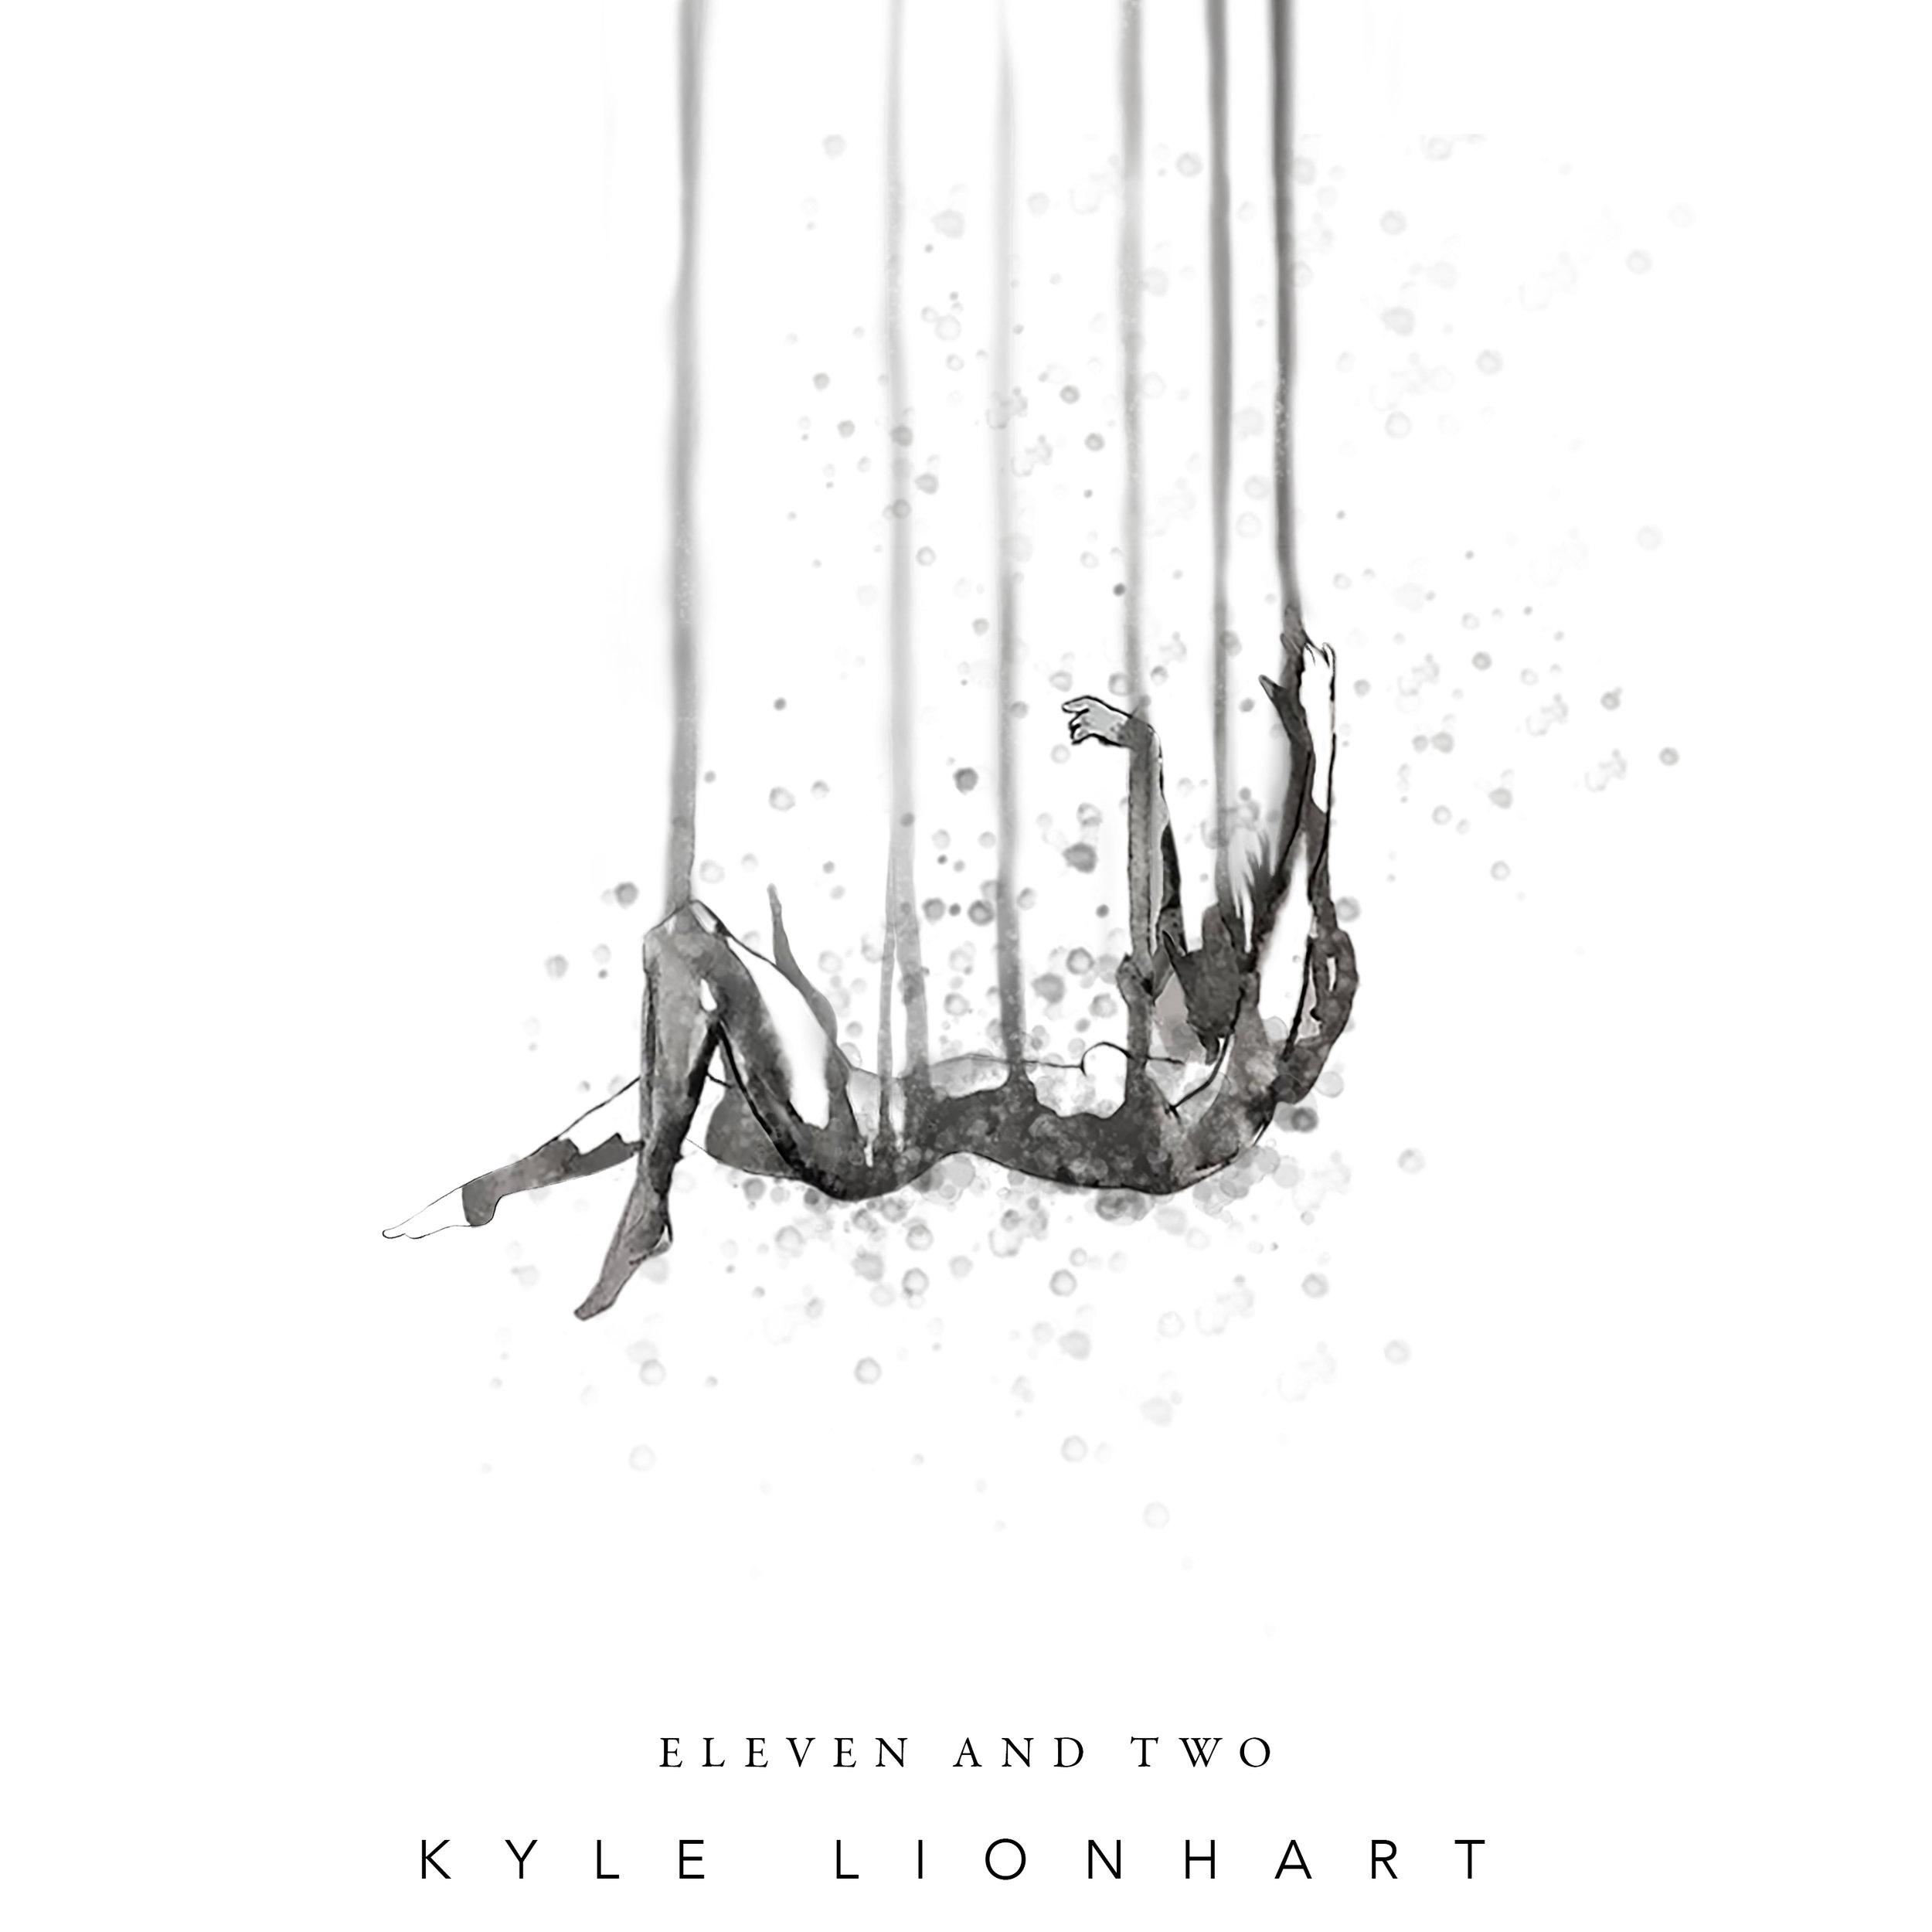 Kyle ELEVEN & TWO EP ARTWORK DIGITAL.jpg